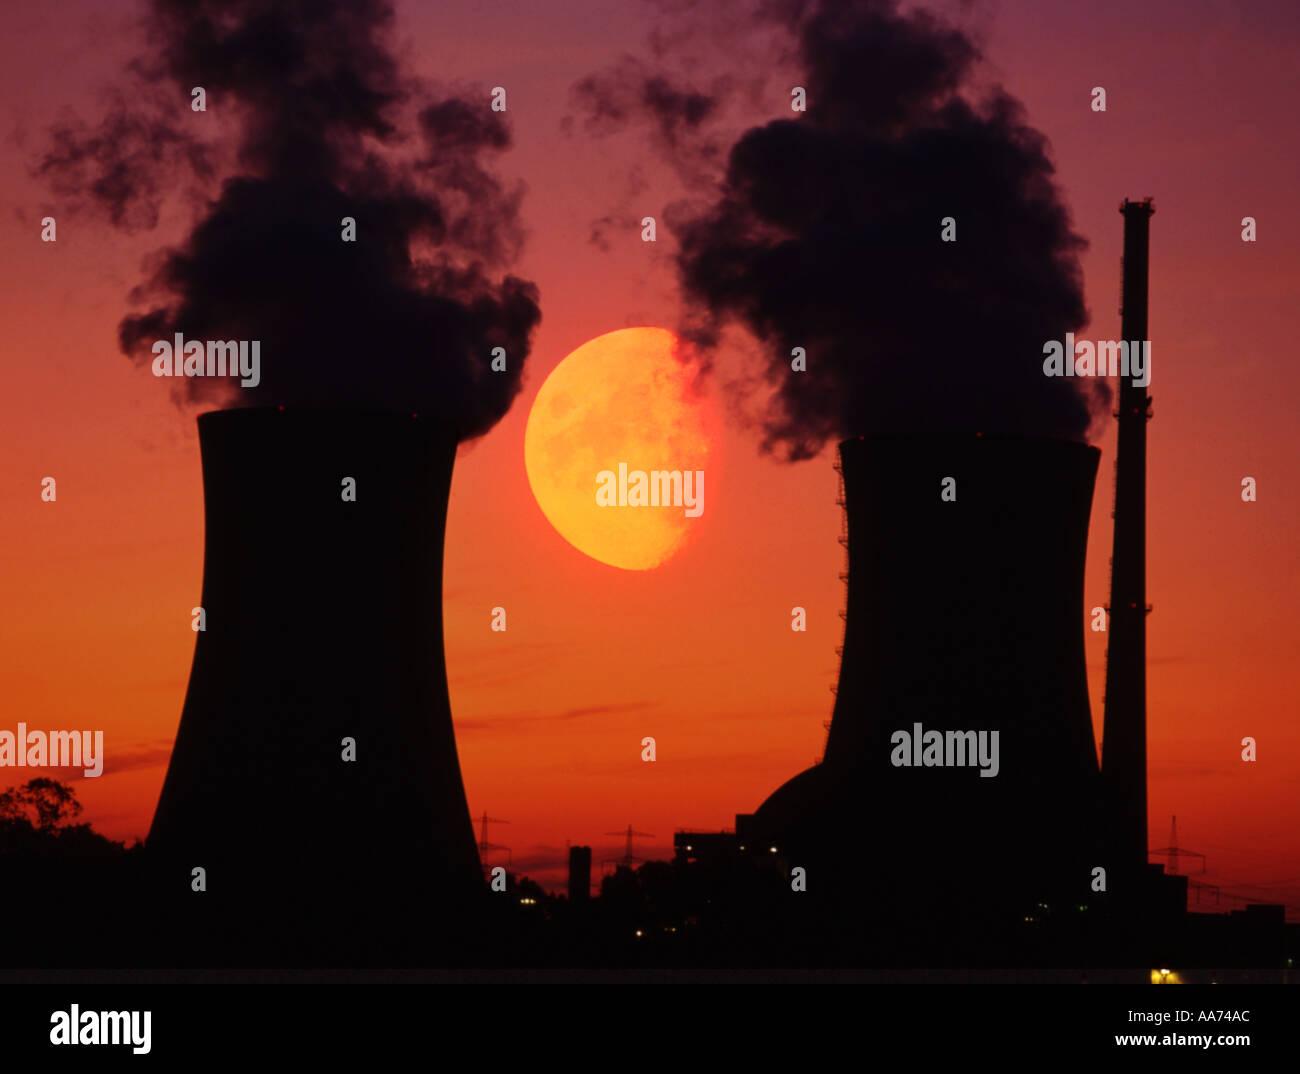 Nuclear Power Kühltürme Station symbolische Emission Atomenergie Stockbild